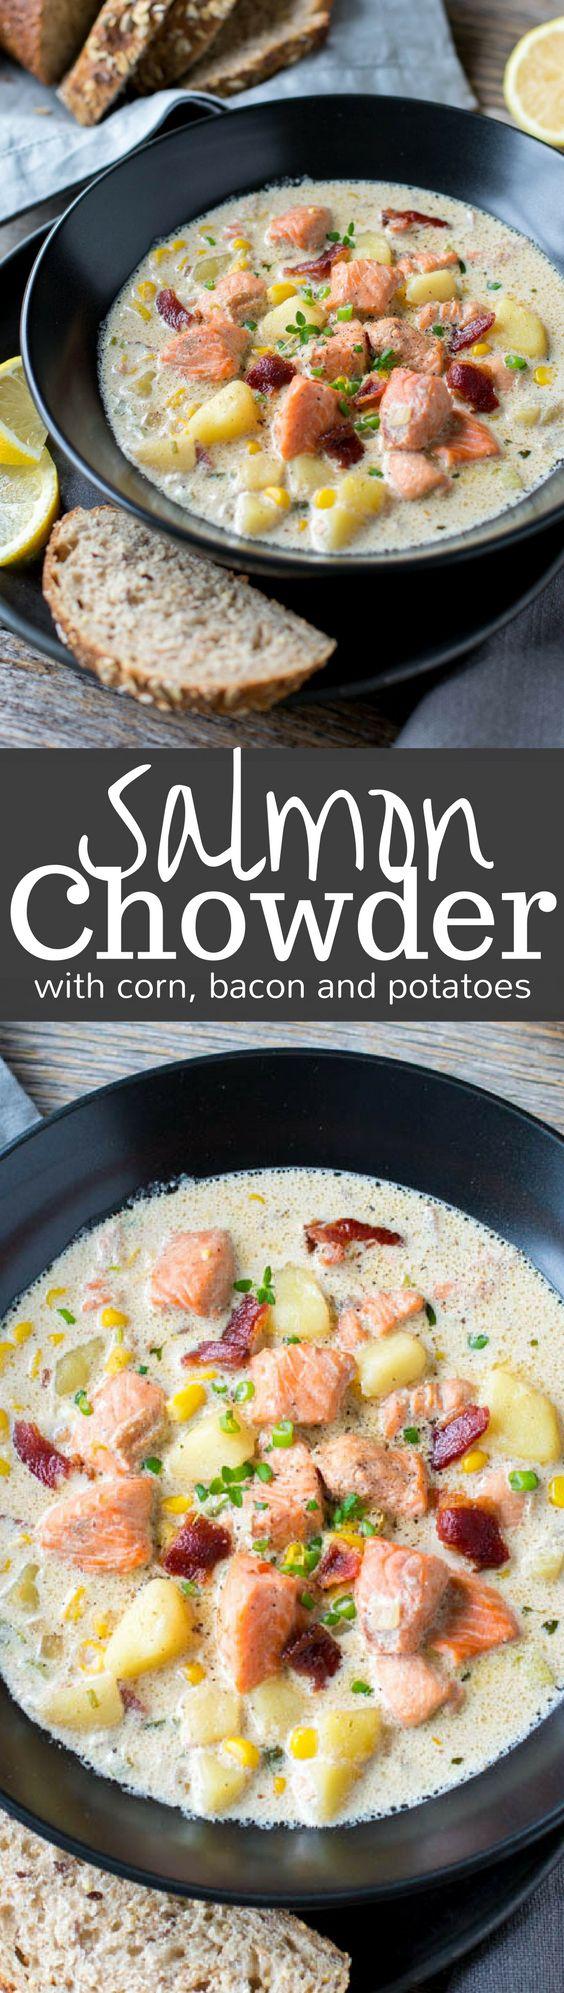 Salmon Chowder Recipe